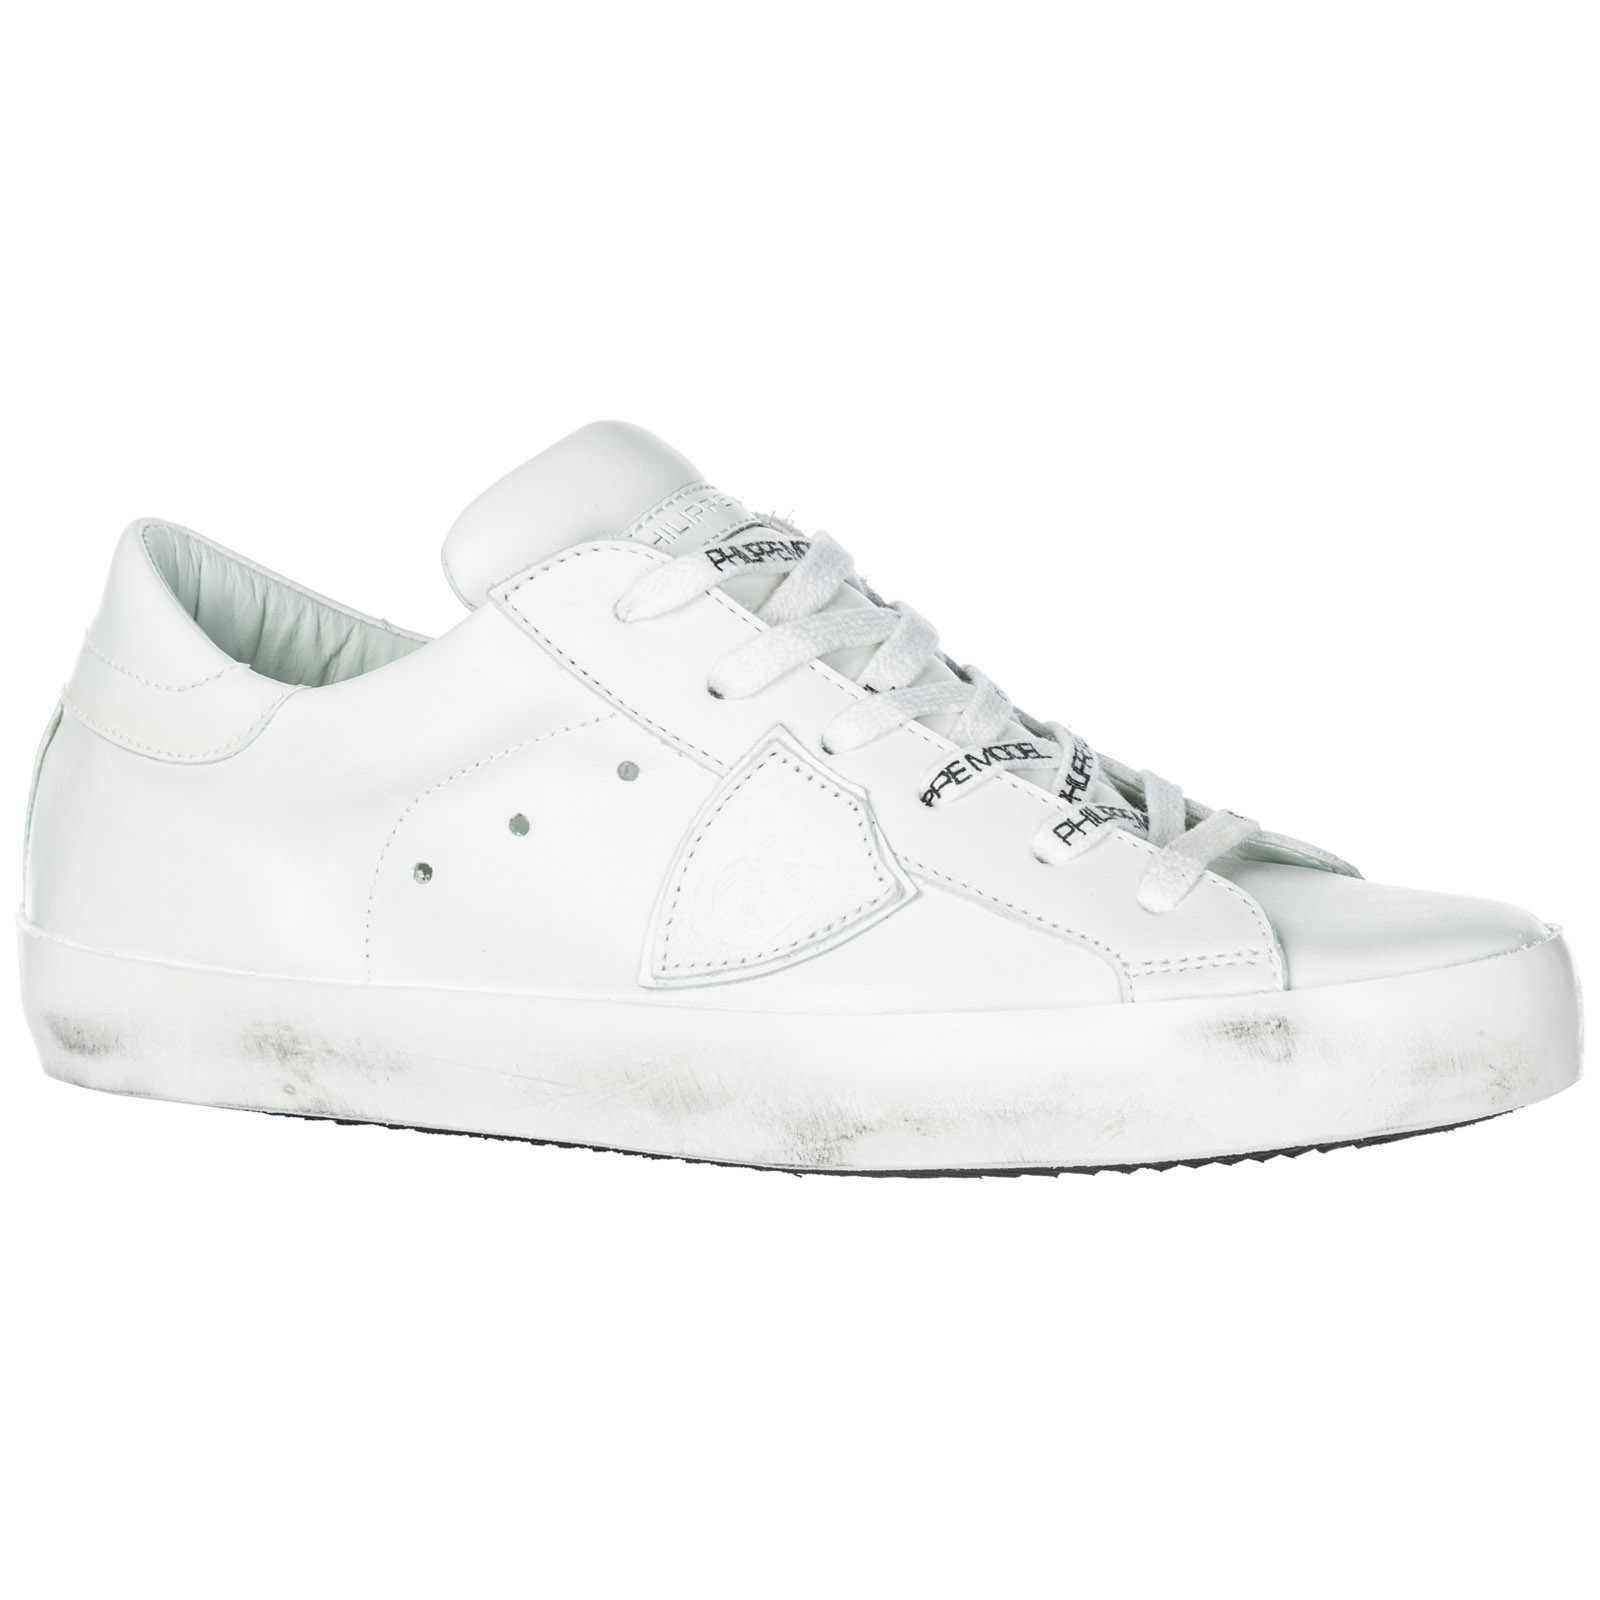 0fe7a37f72518 Sneakers Philippe Model Paris A1UNCLLD1001 blanc   blanc